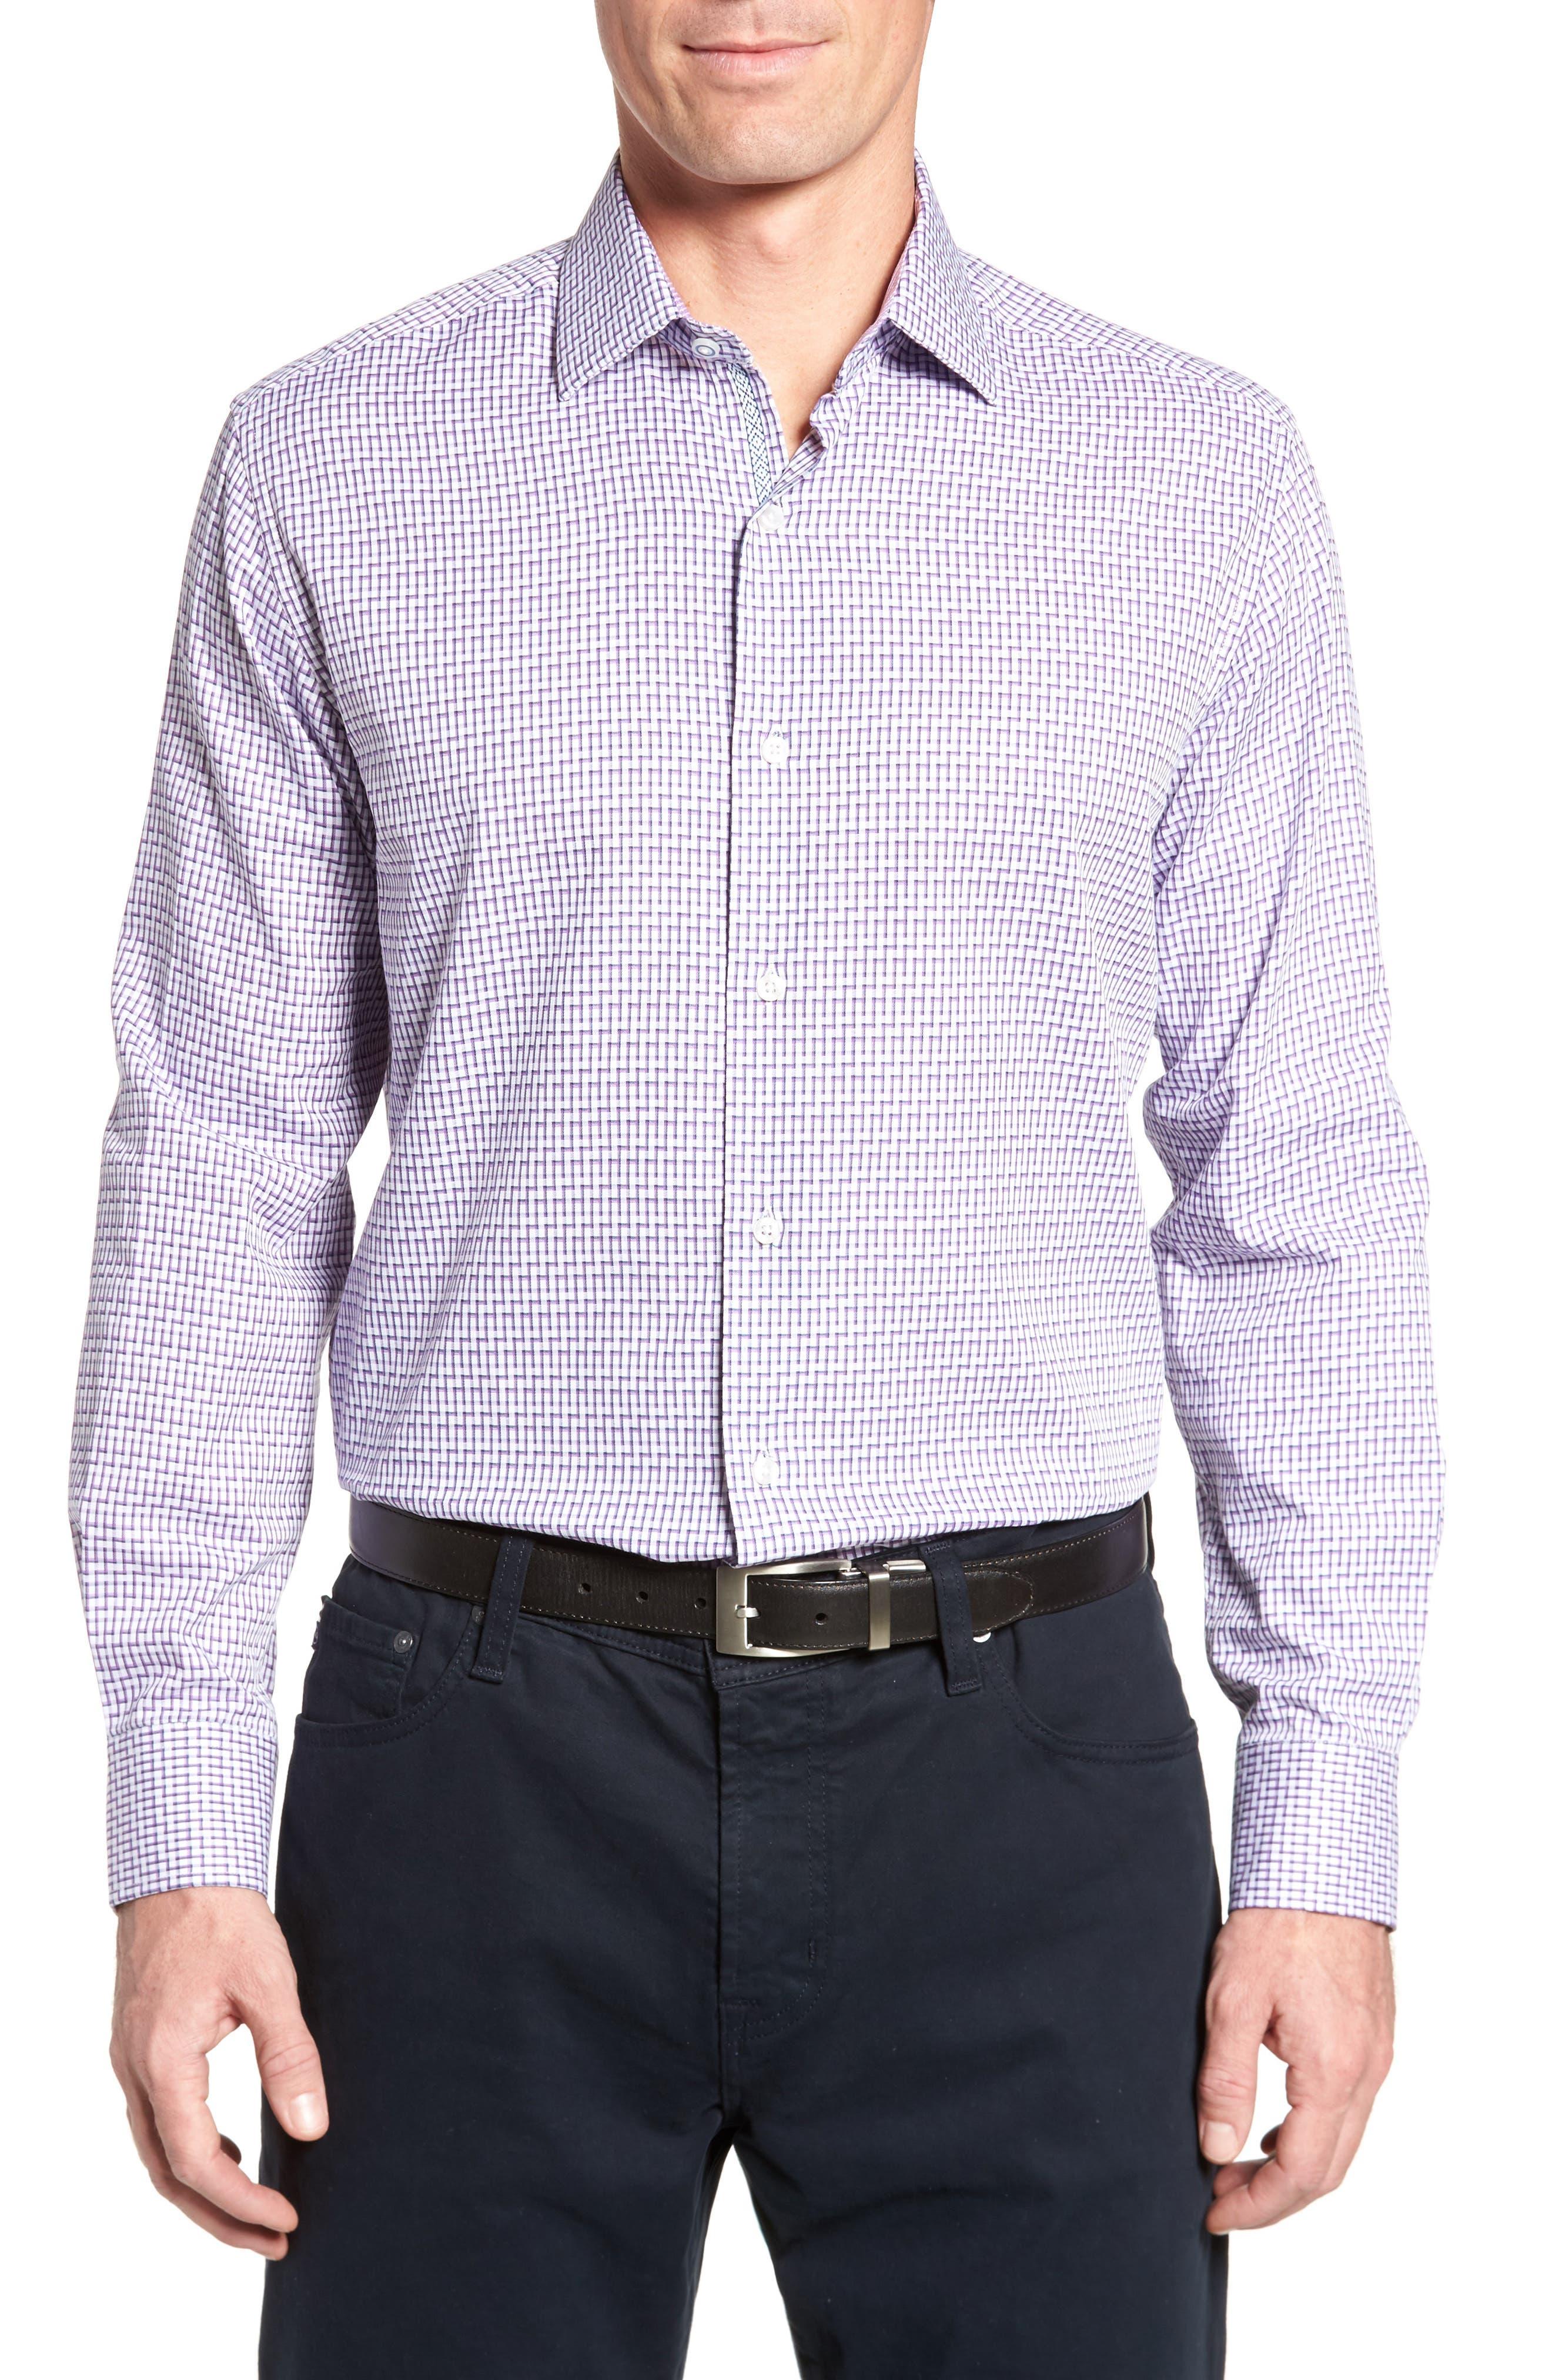 Main Image - Tailorbyrd Pineville Print Sport Shirt